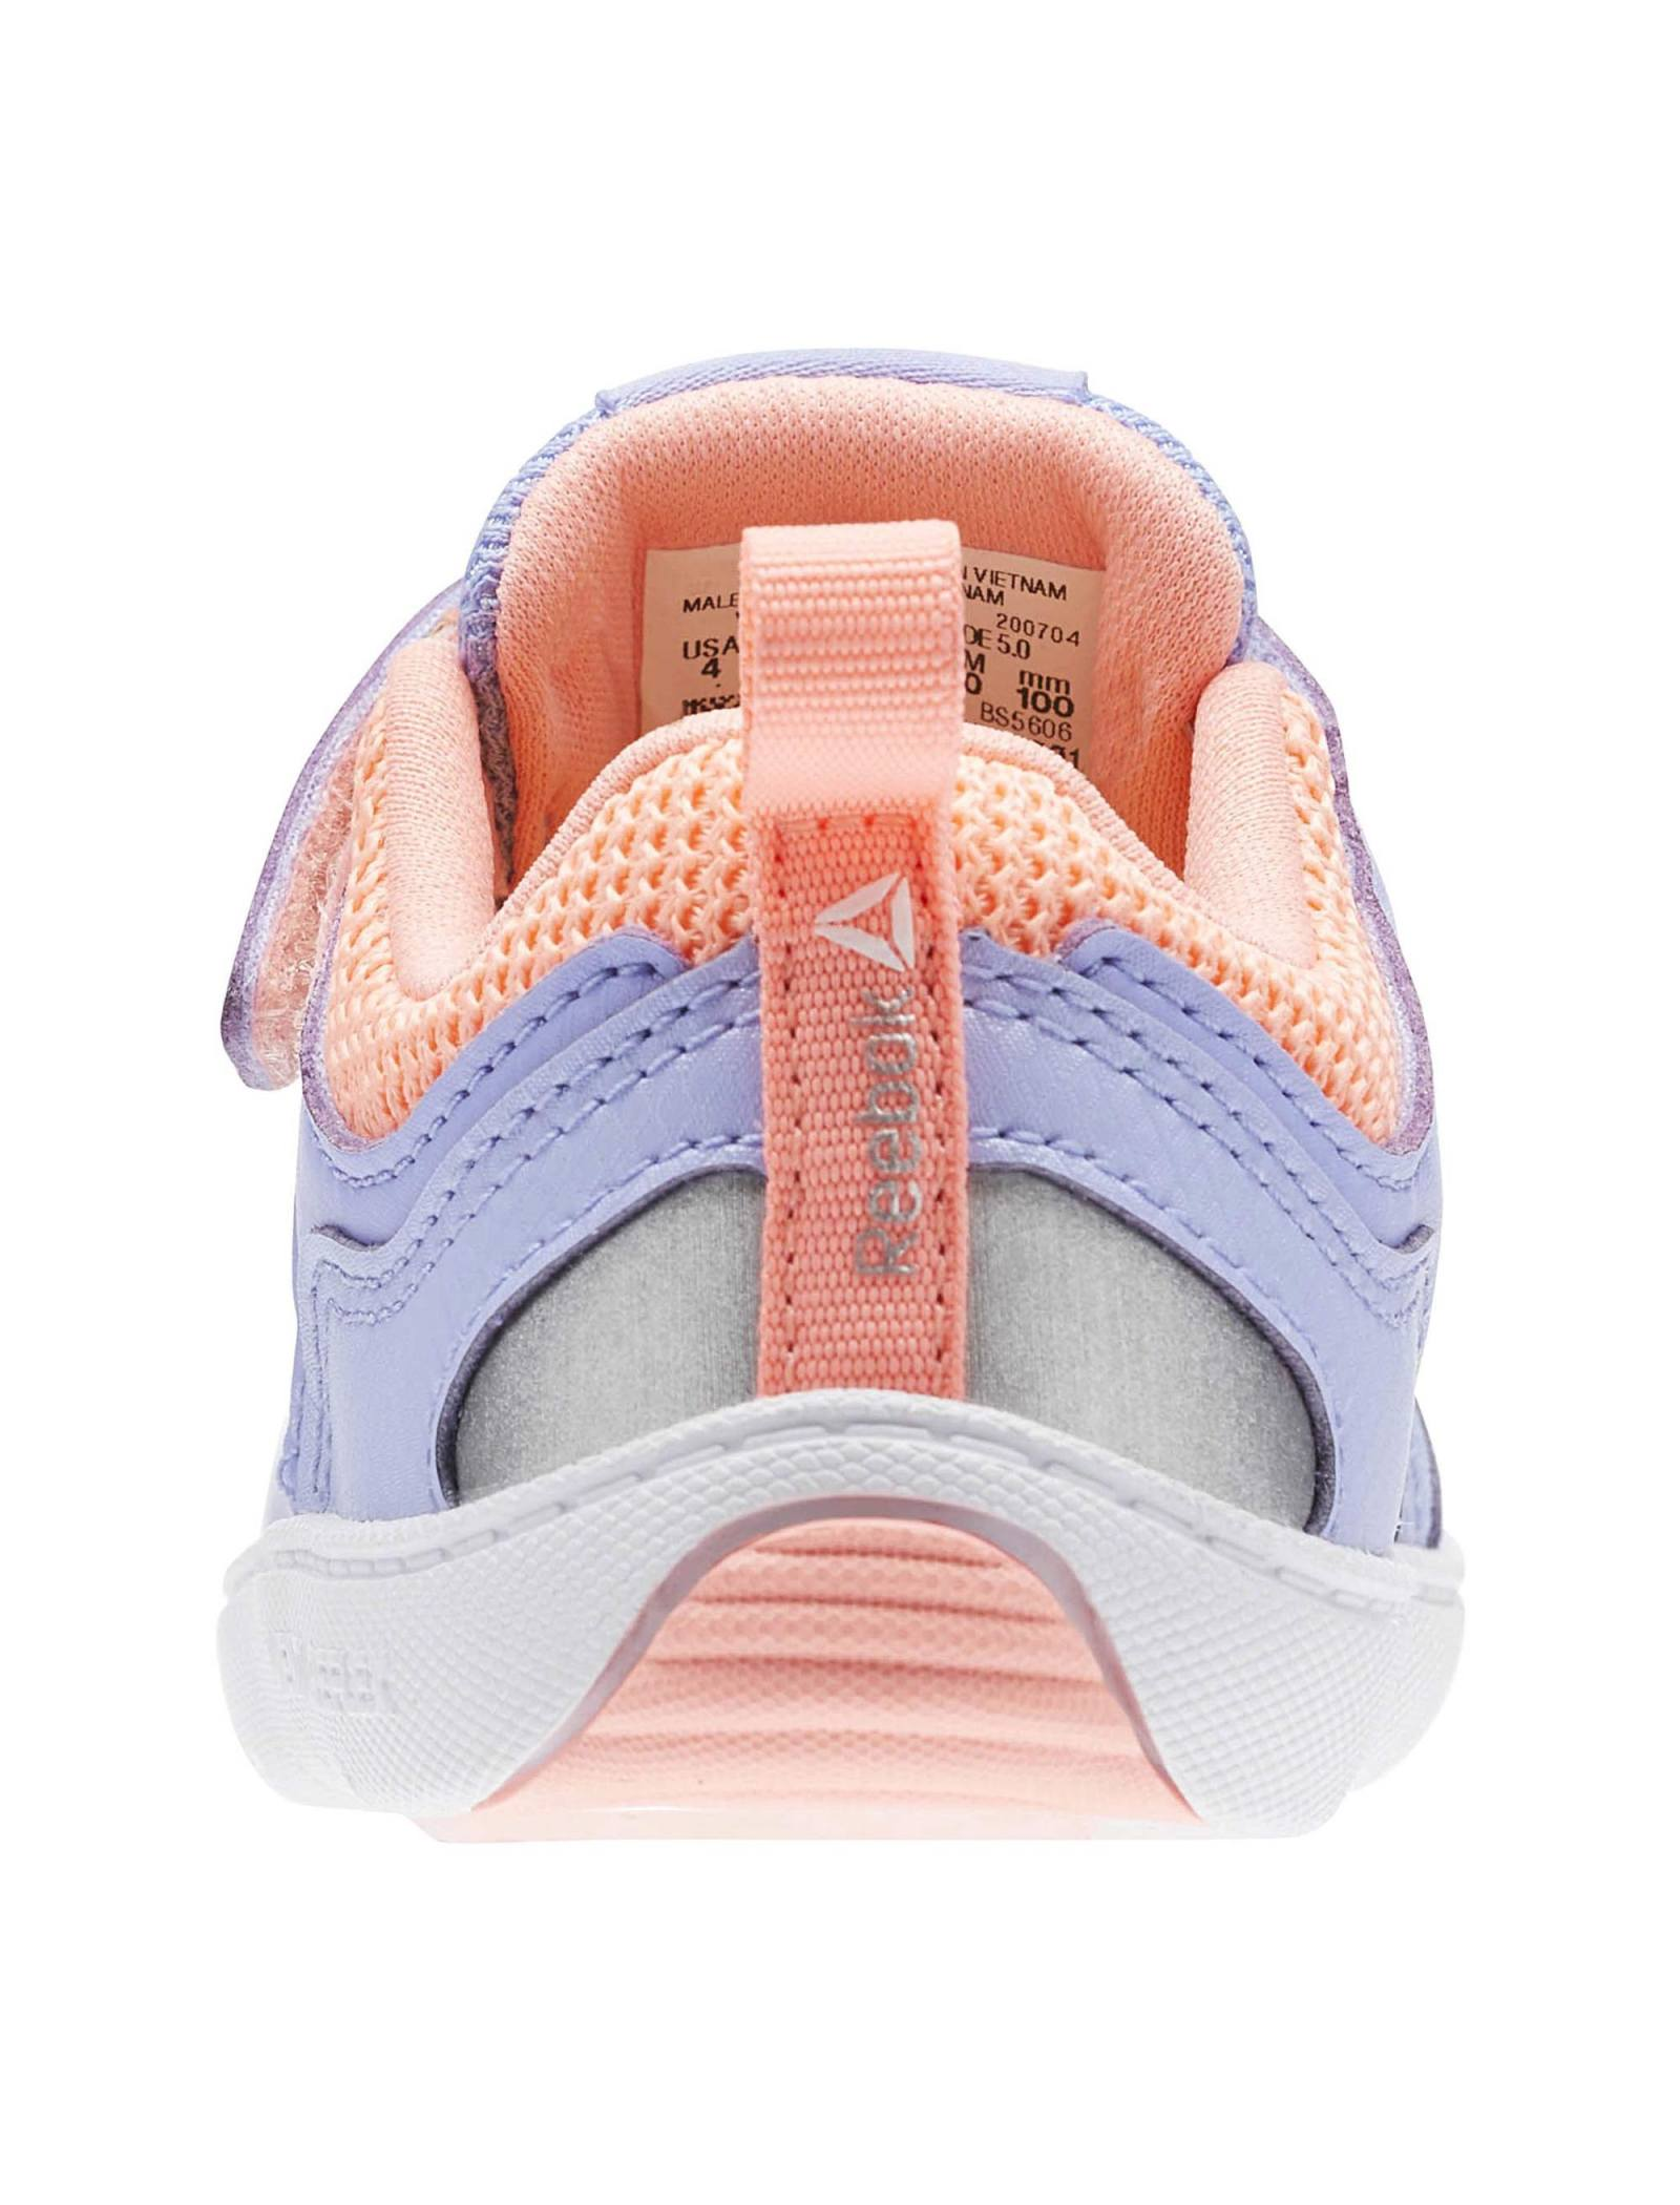 کفش دویدن چسبی نوزادی Ventureflex Stride 5-0 - ریباک - ياسي - 6